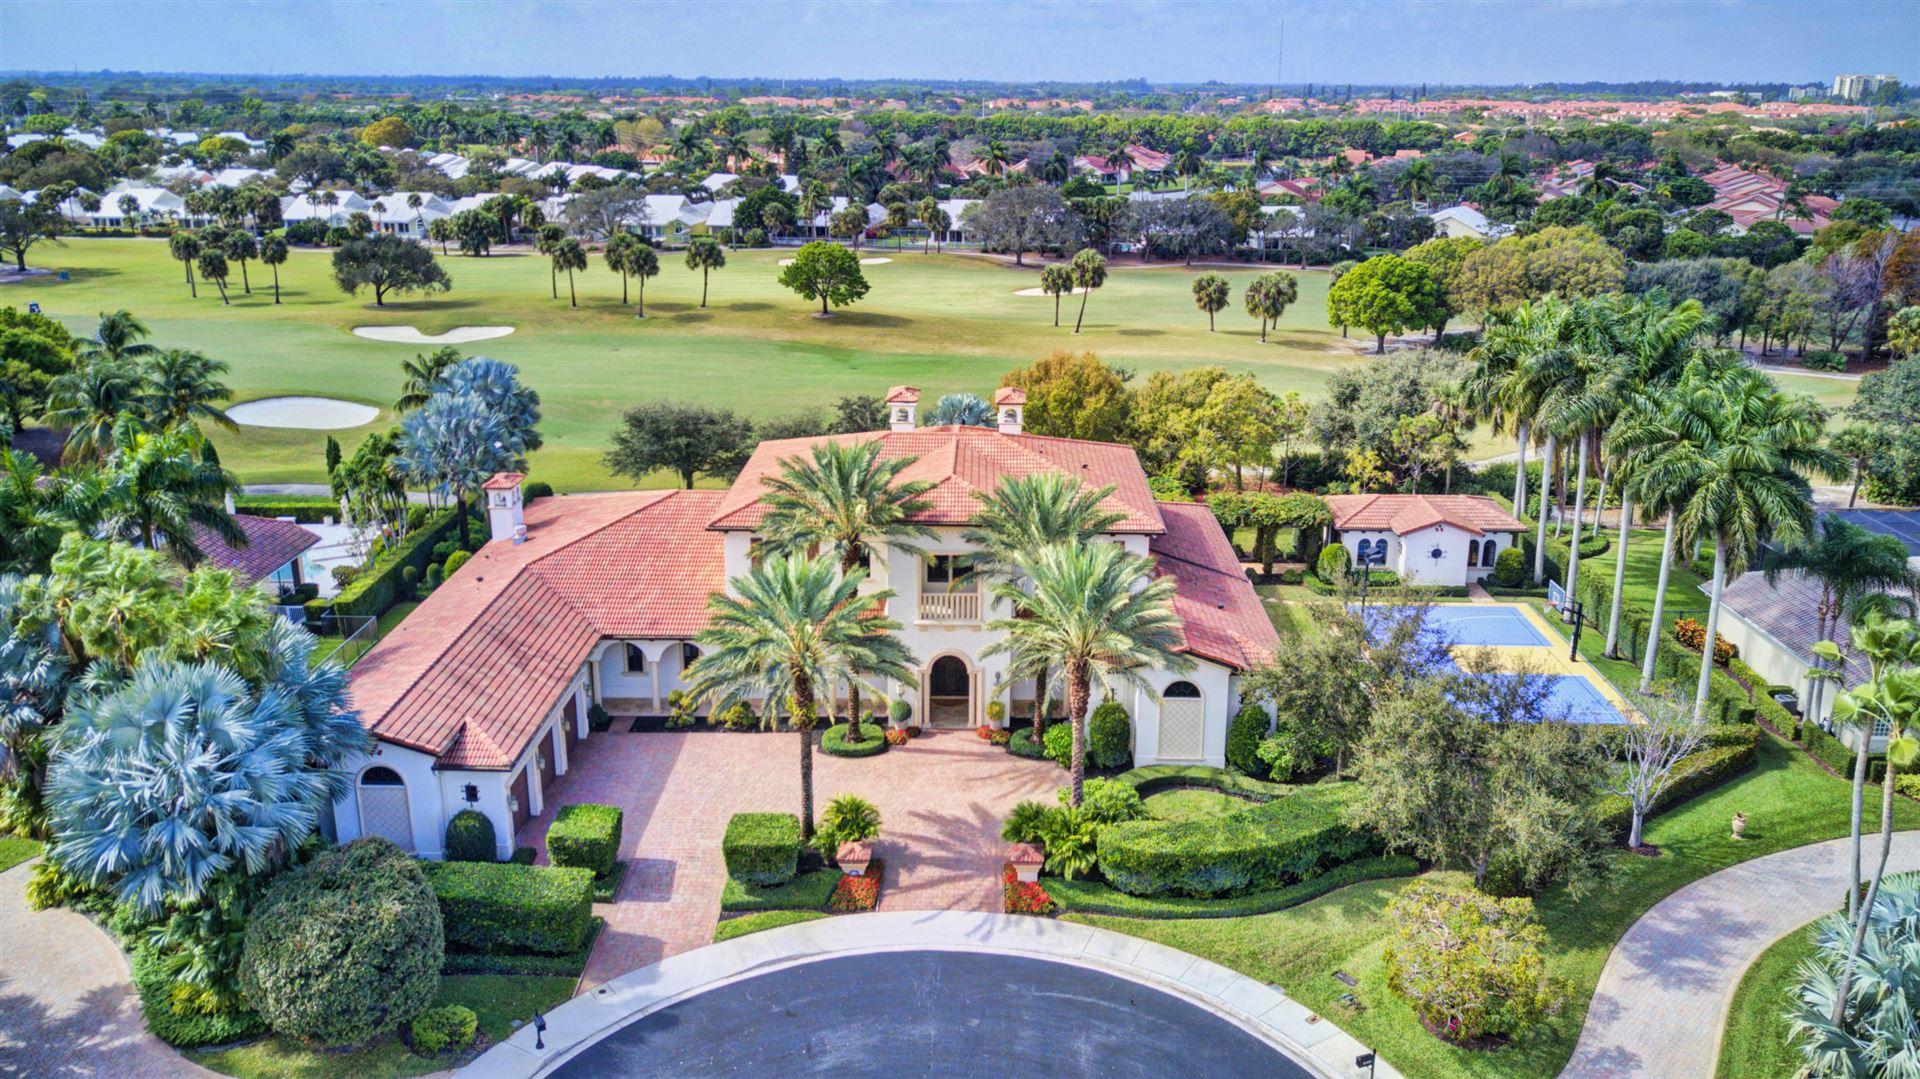 2671 Dakota Circle, West Palm Beach, FL 33409 - #: RX-10599786